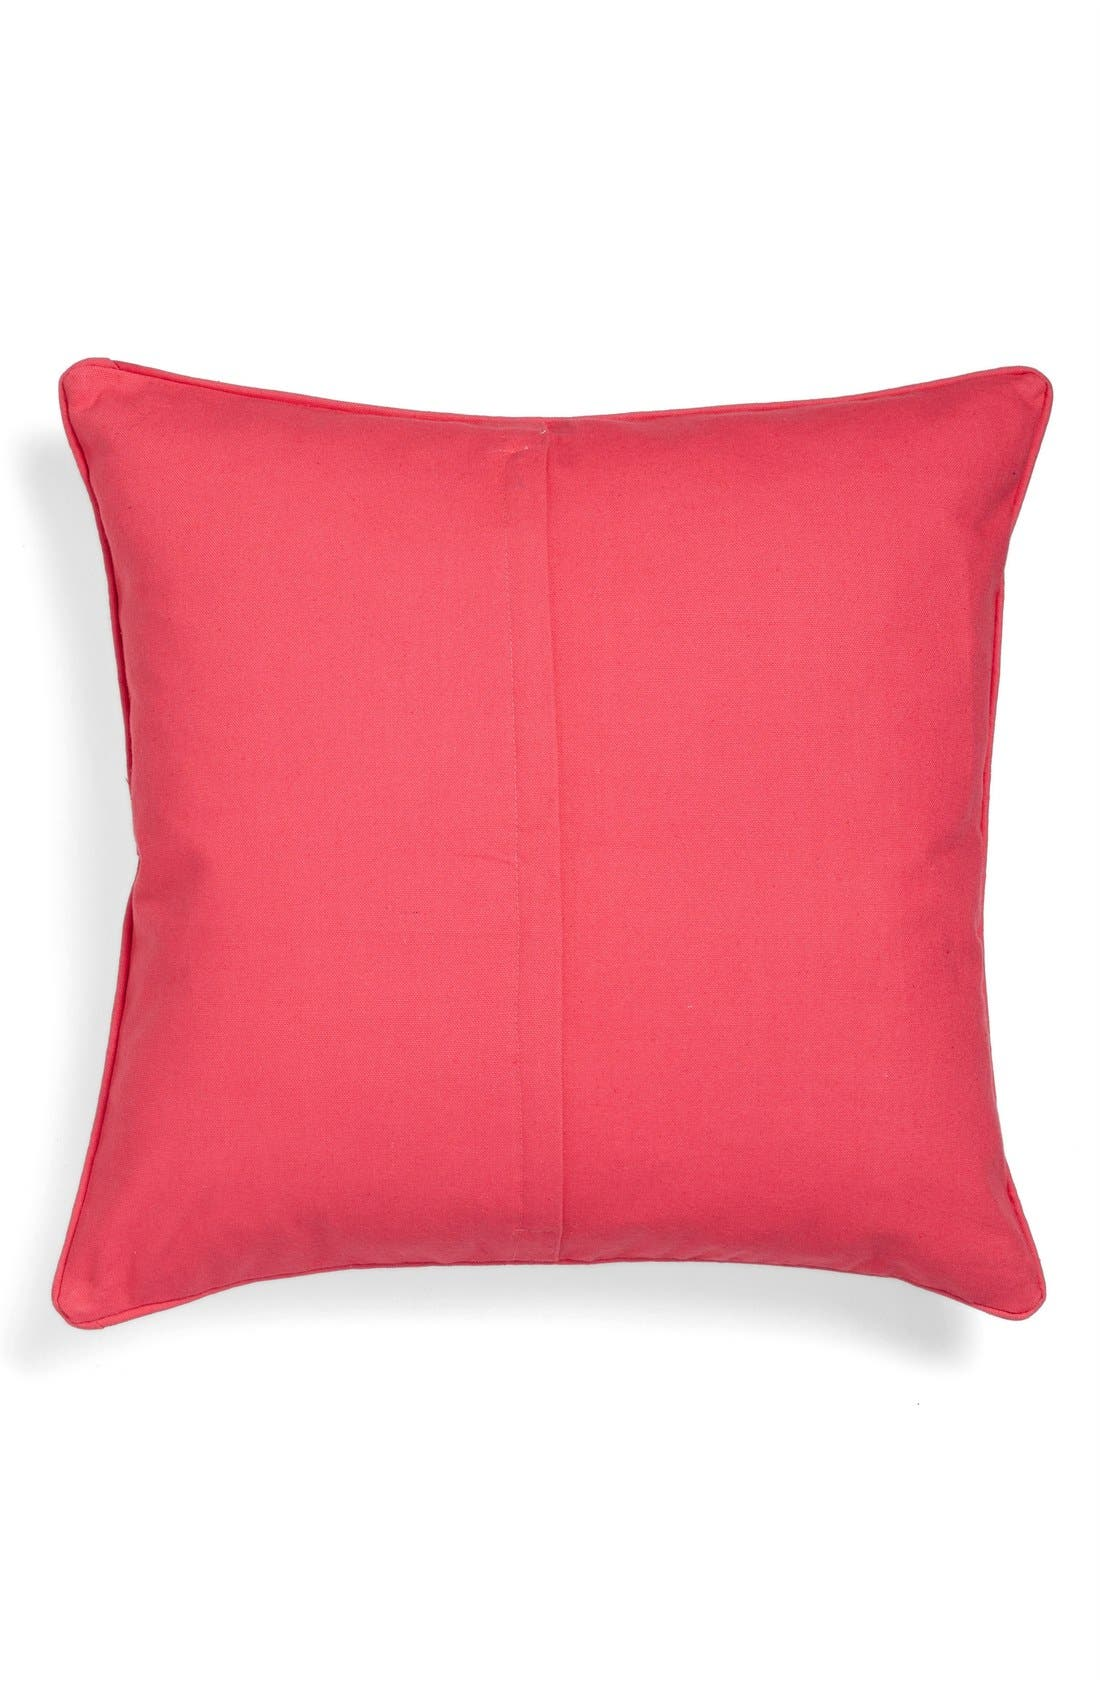 Alternate Image 2  - Levtex 'Happy Day' Pillow